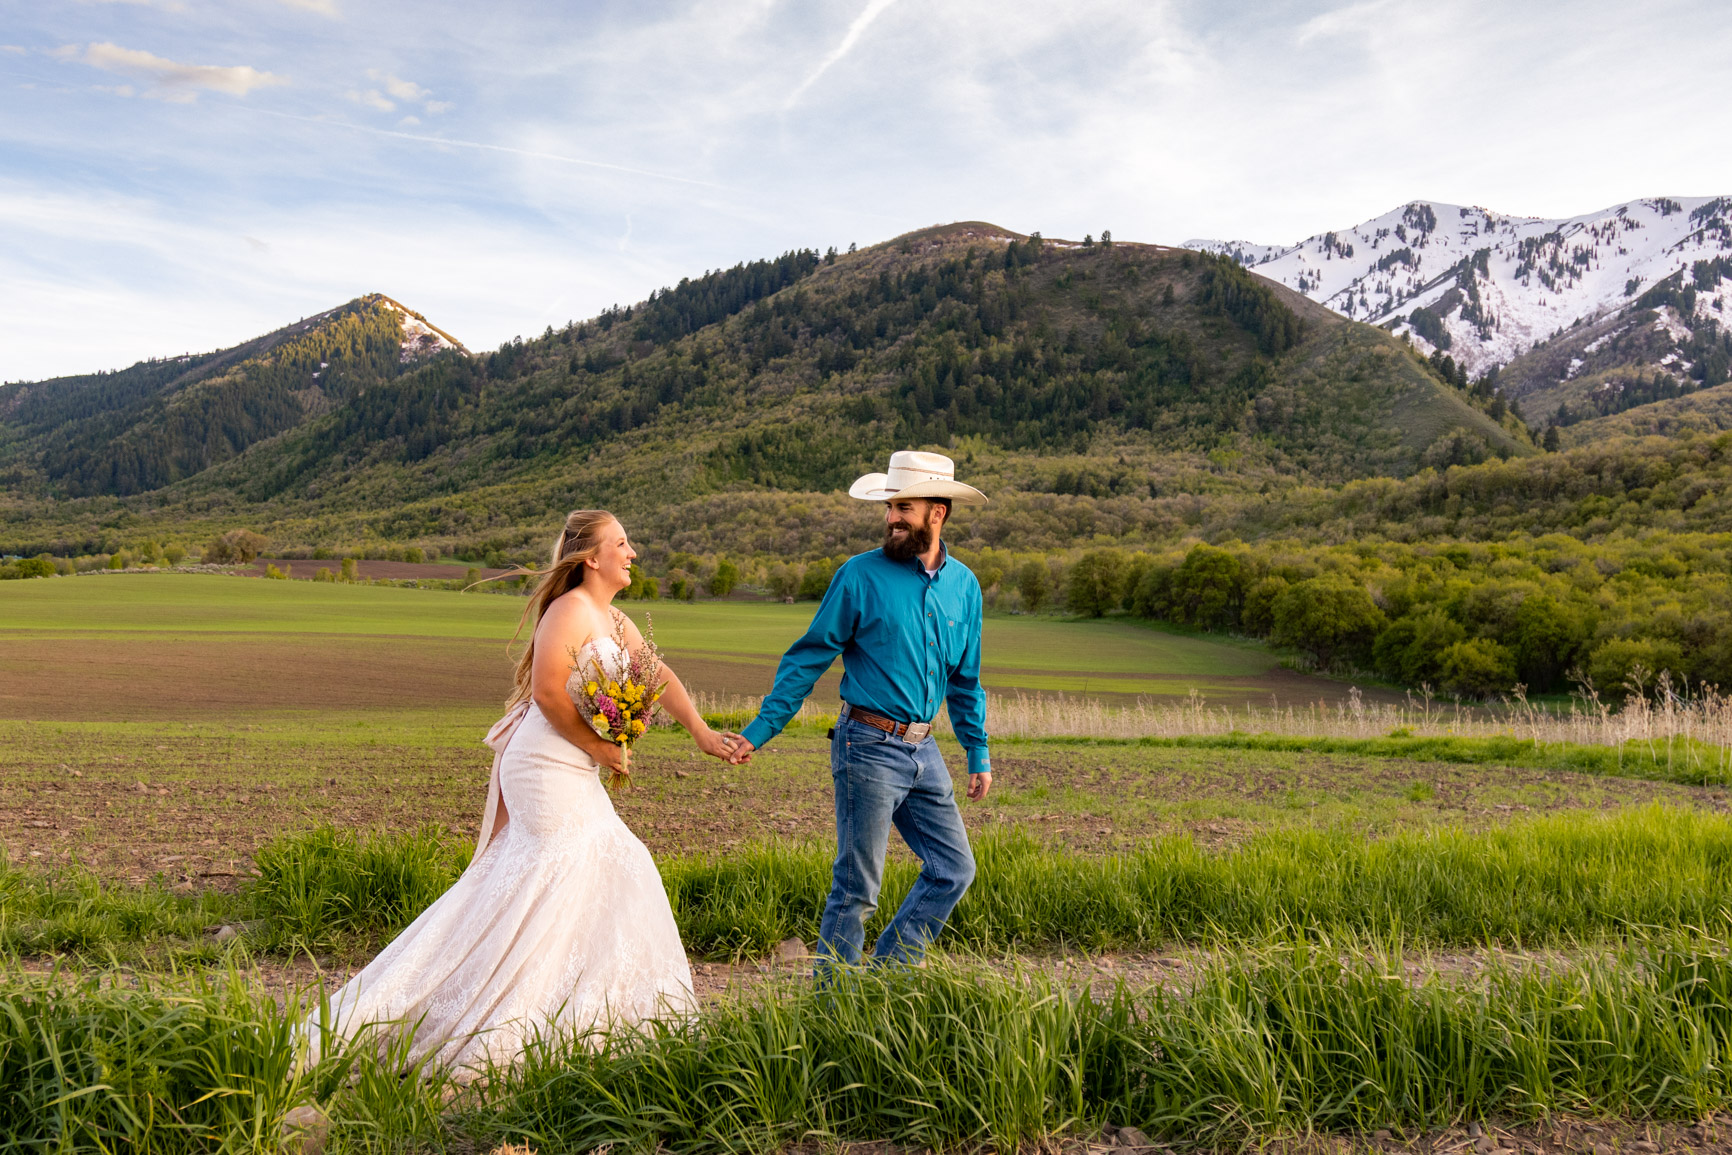 Utah Rocky Mountain Elopement Wasatch Mountains Bridal Shoot Halie West Adventure Photography 5